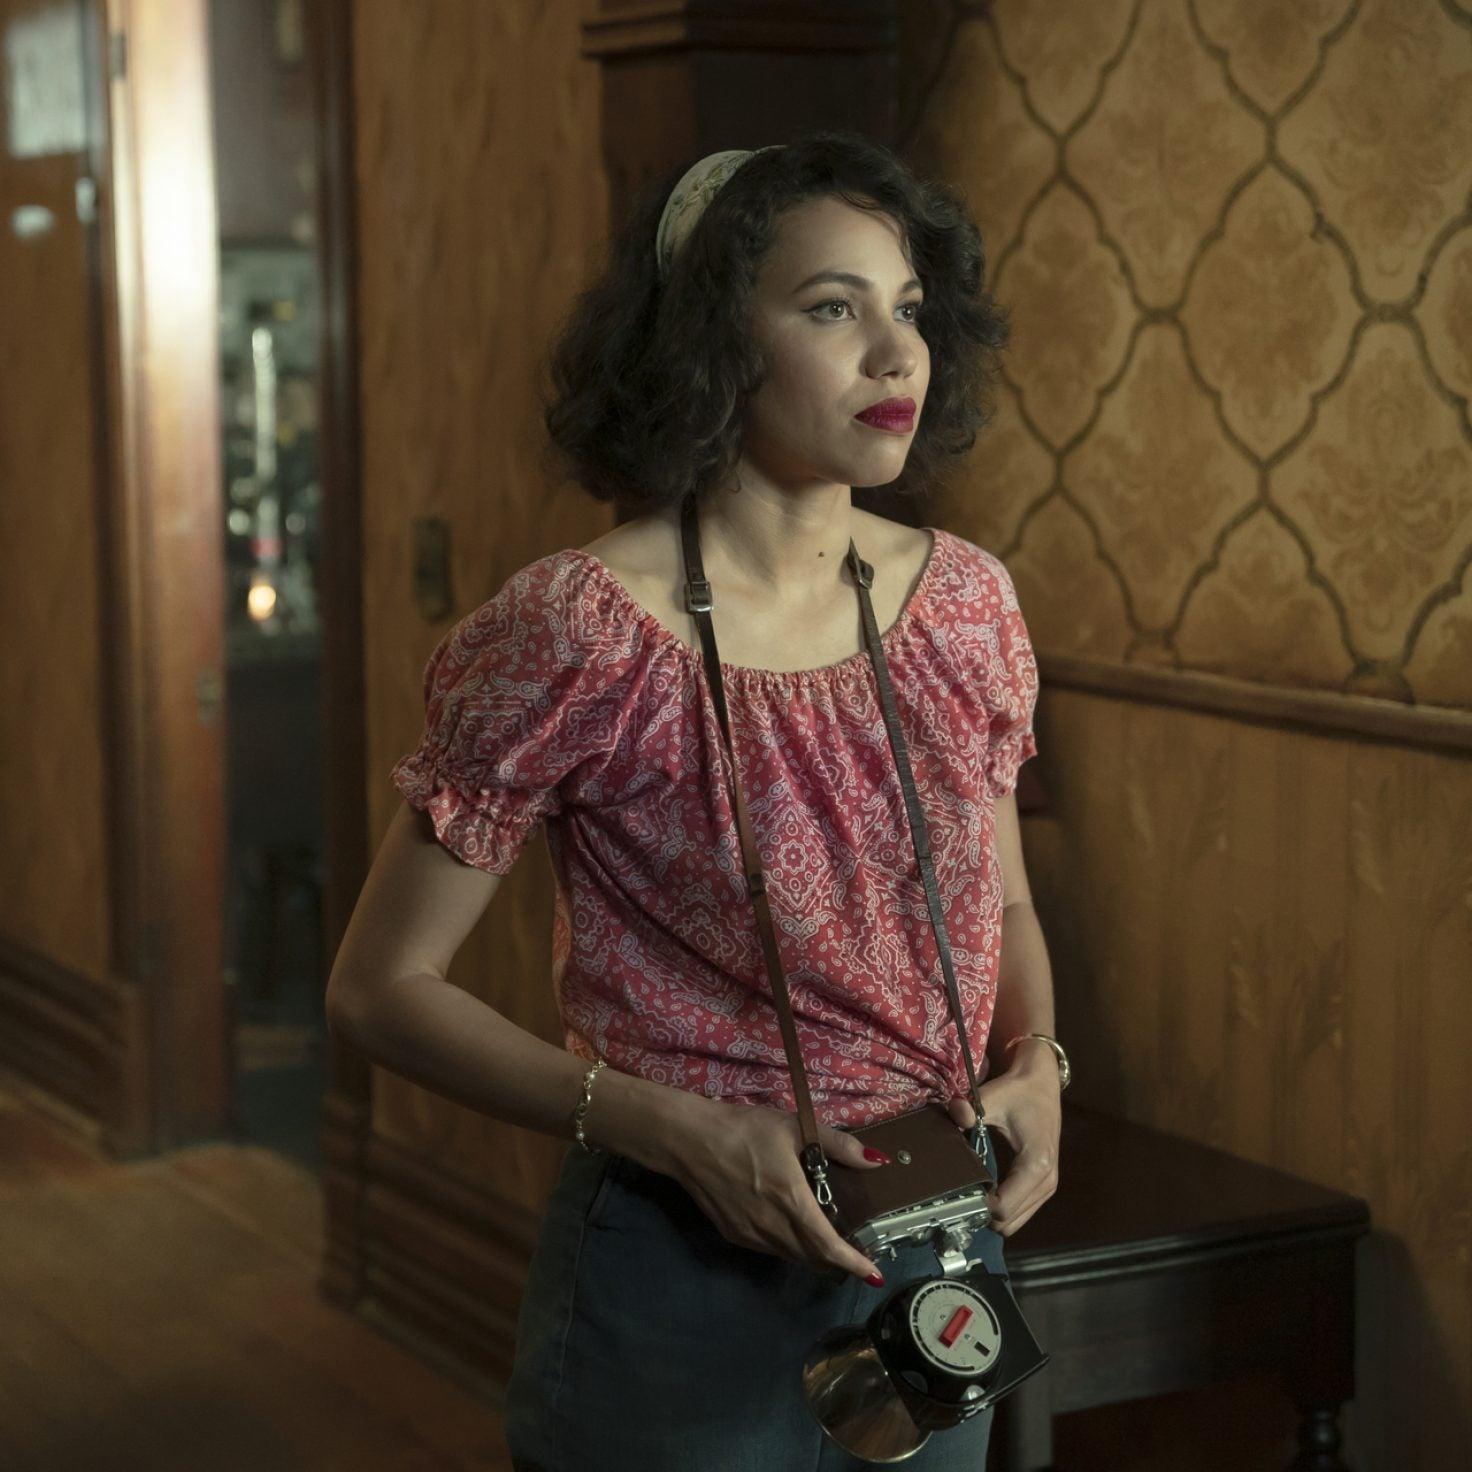 Jurnee Smollett Shares Behind-The-Scenes Burn Marks From That Horrific 'Lovecraft Country' Scene